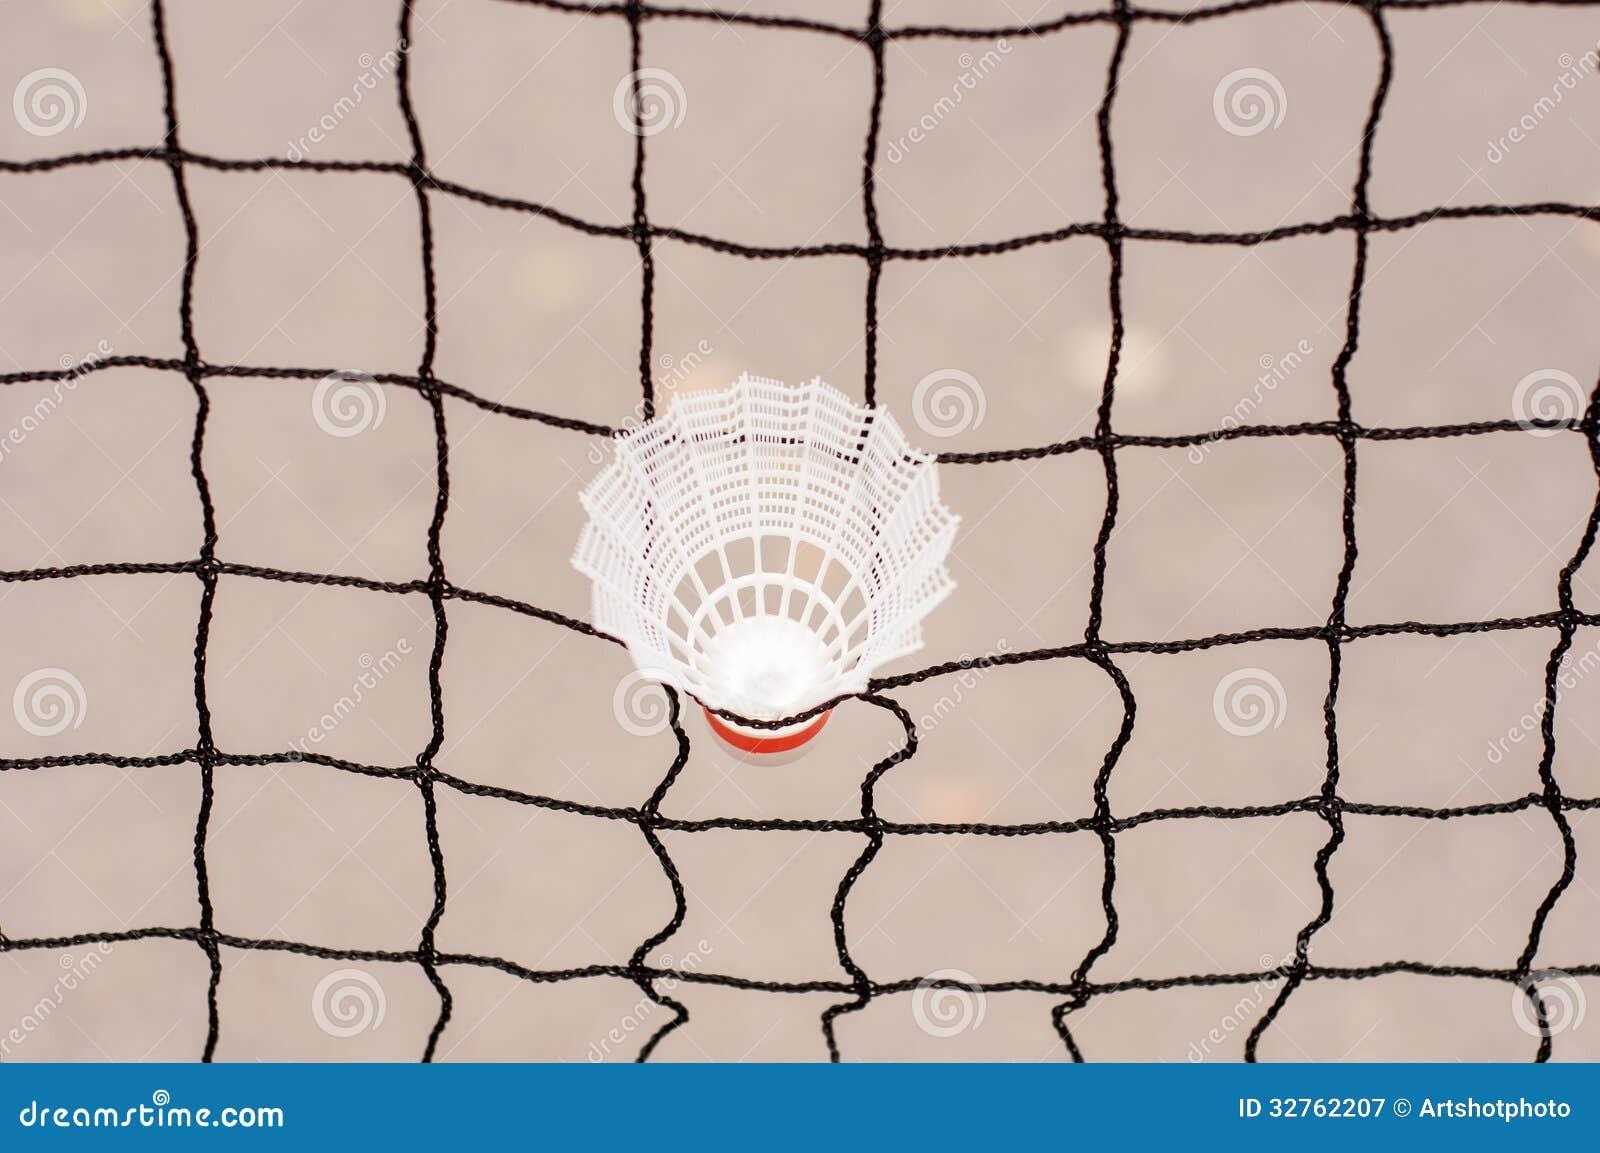 captif de volant dans un filet de badminton image stock. Black Bedroom Furniture Sets. Home Design Ideas